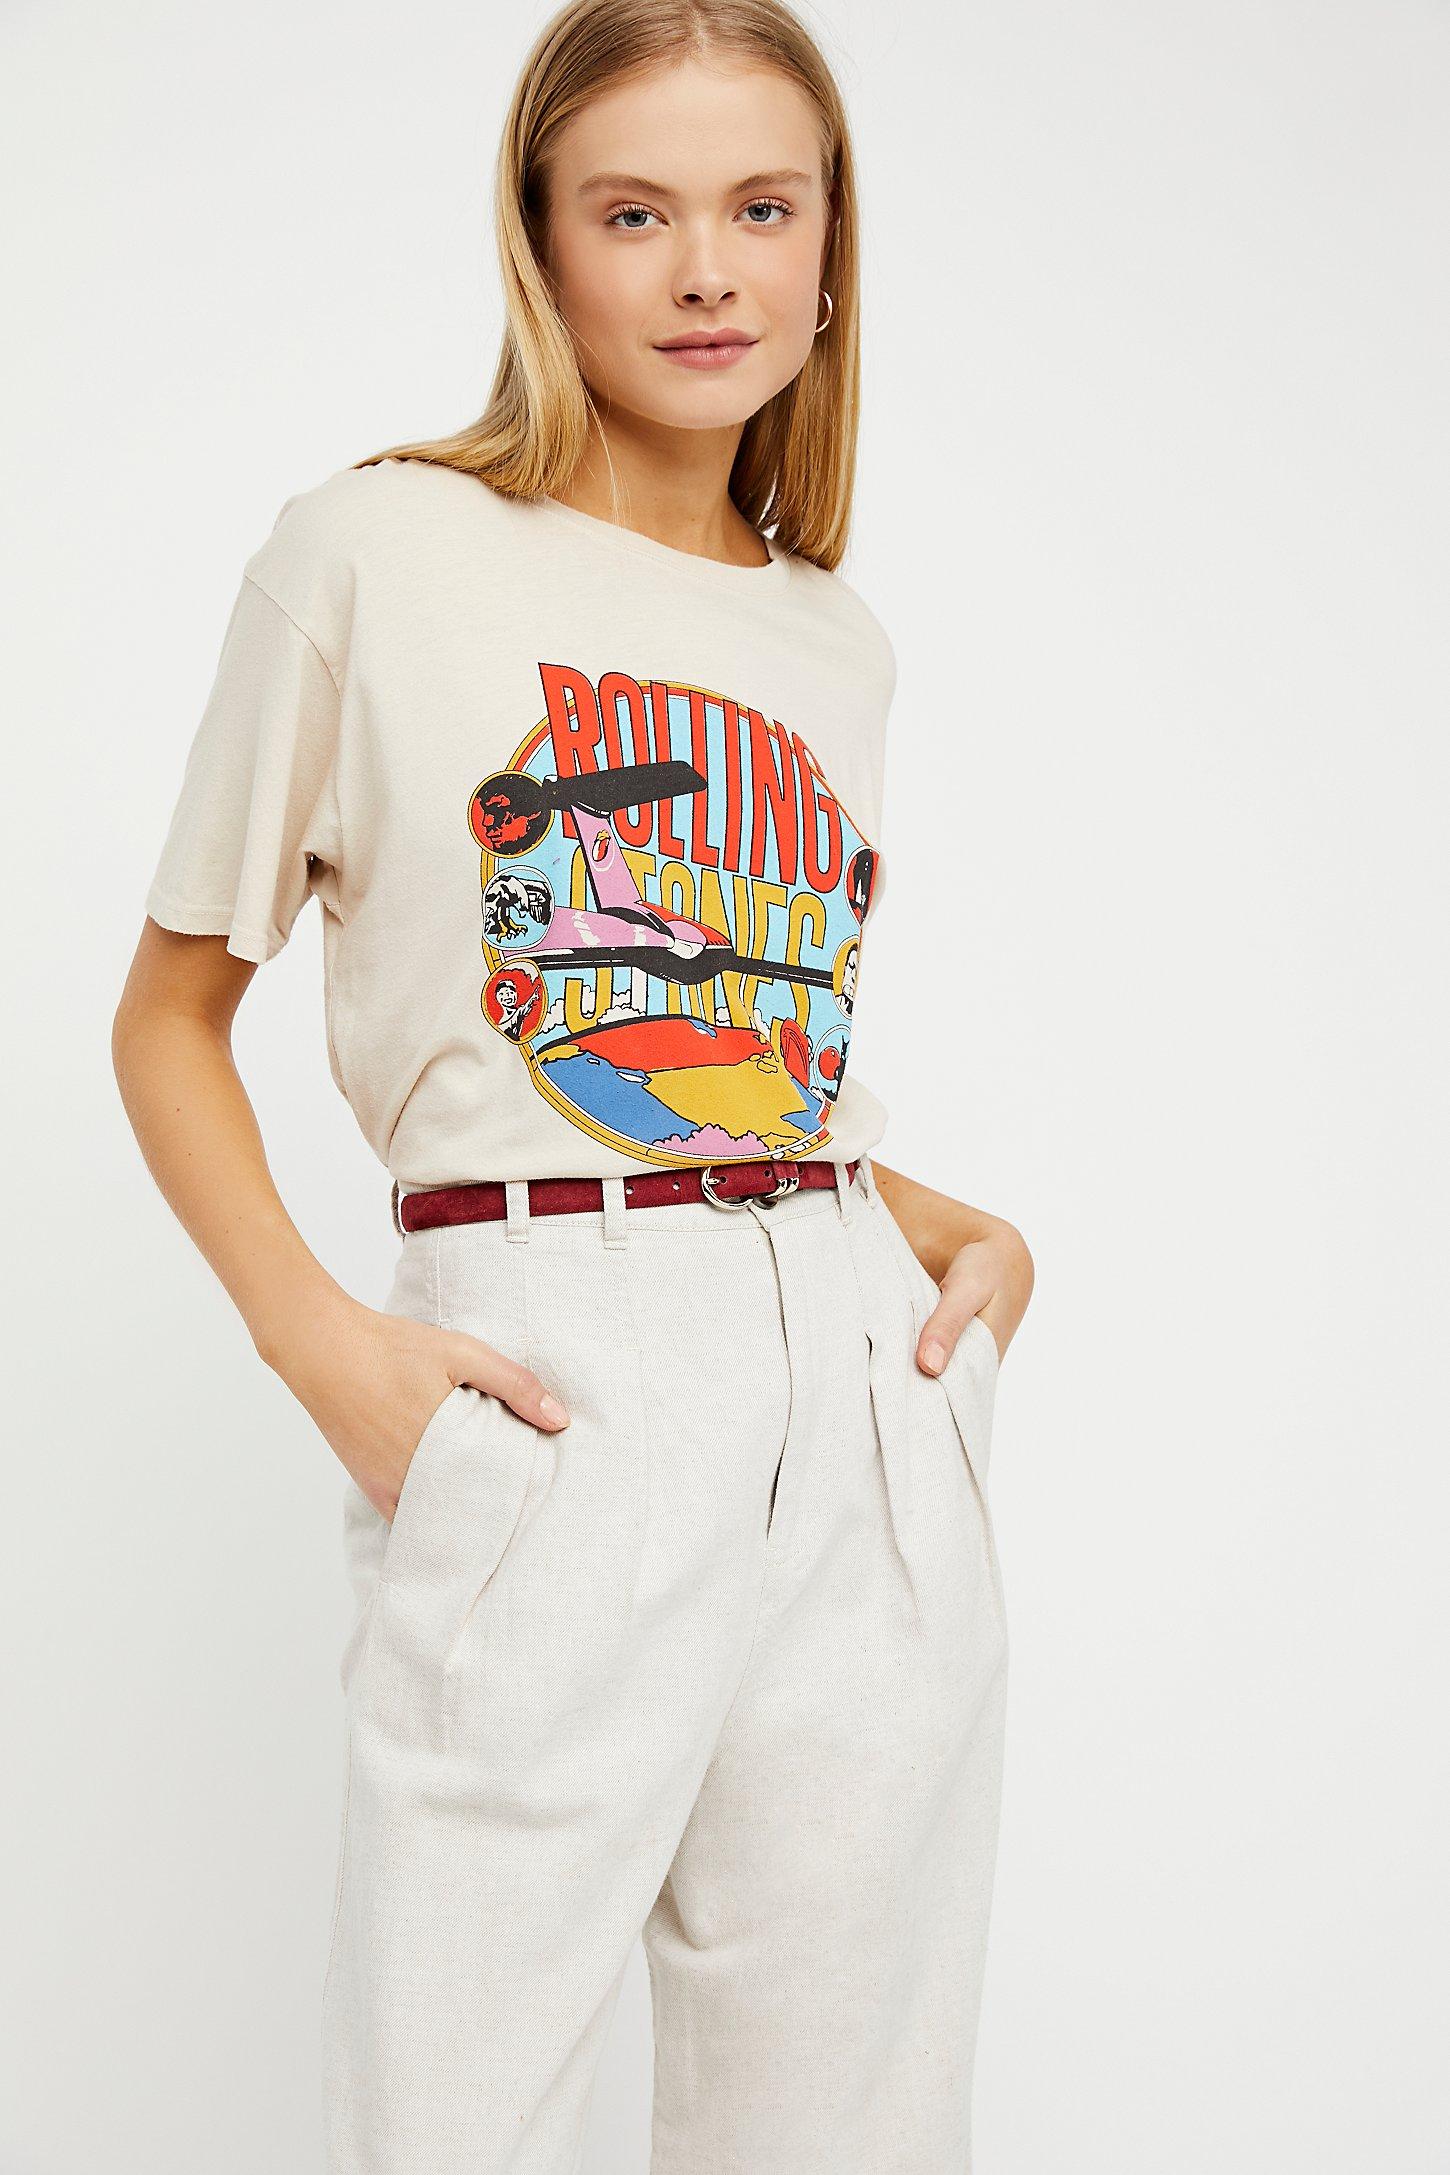 830d1b9a060e59 Jastie Stones Around The World Tee   Tops O-Neck Short Sleeve T-shirt 2018  Summer Women Shirt Top Casual Female Clothing